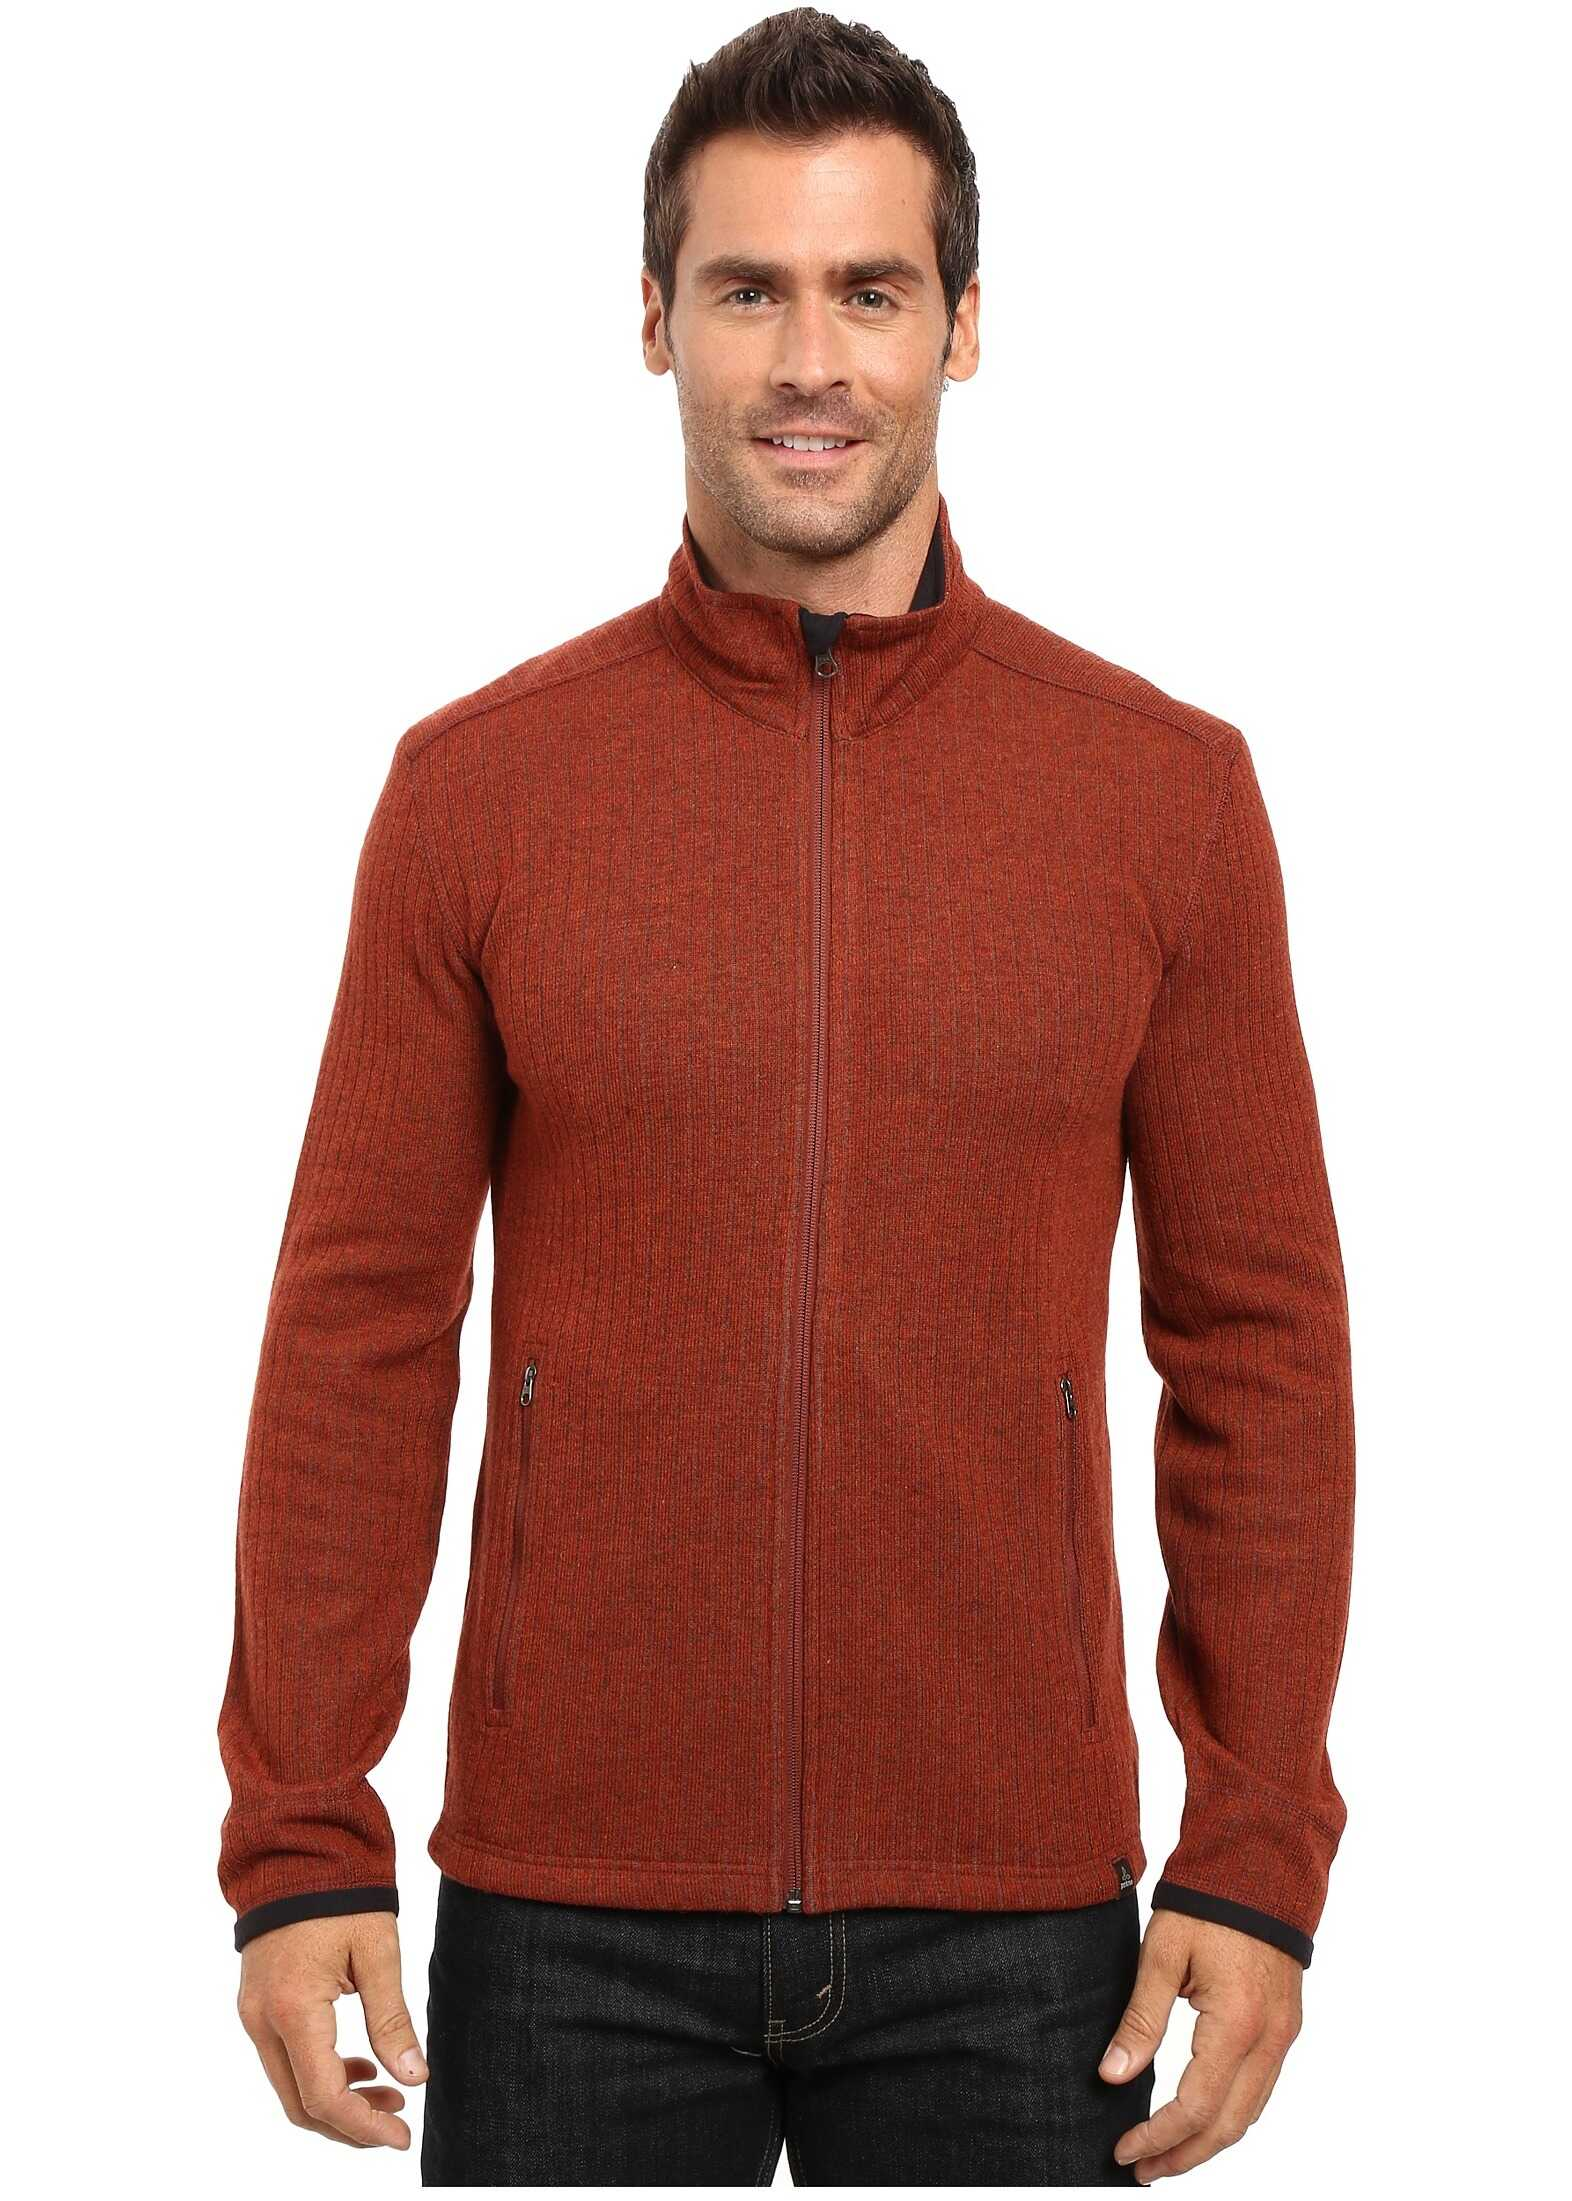 Prana Barclay Sweater Henna